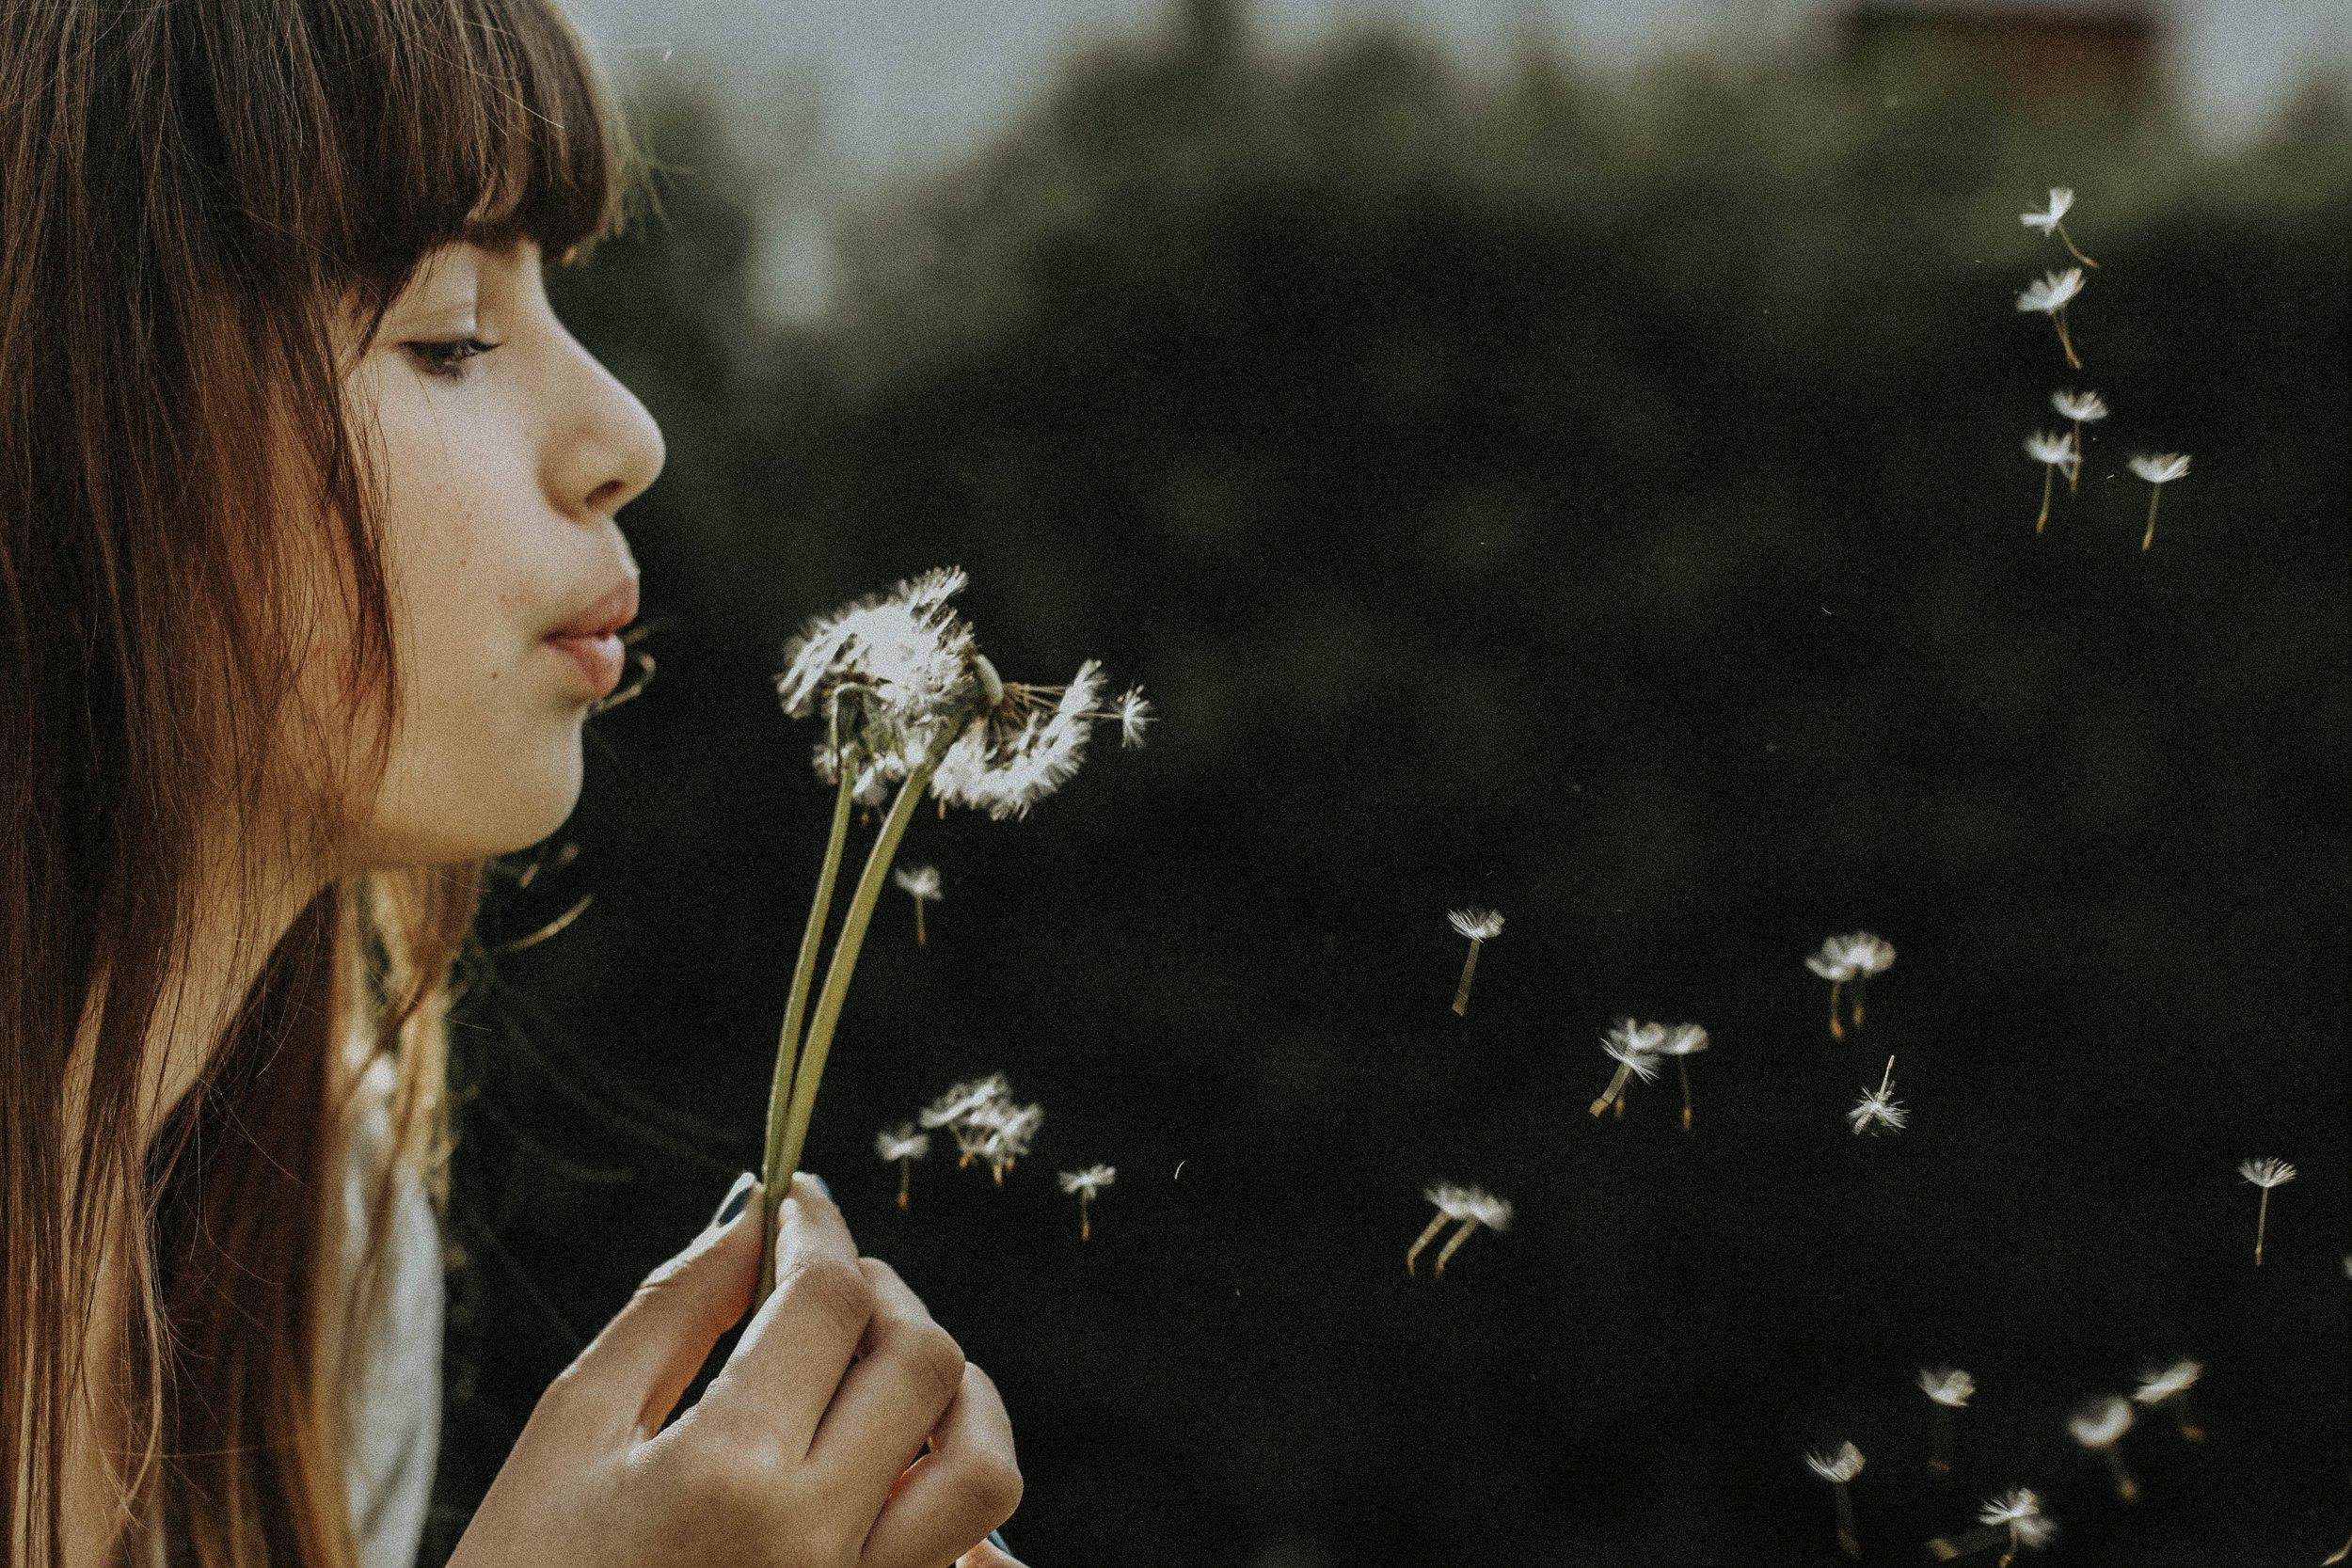 woman with dandelion.jpg